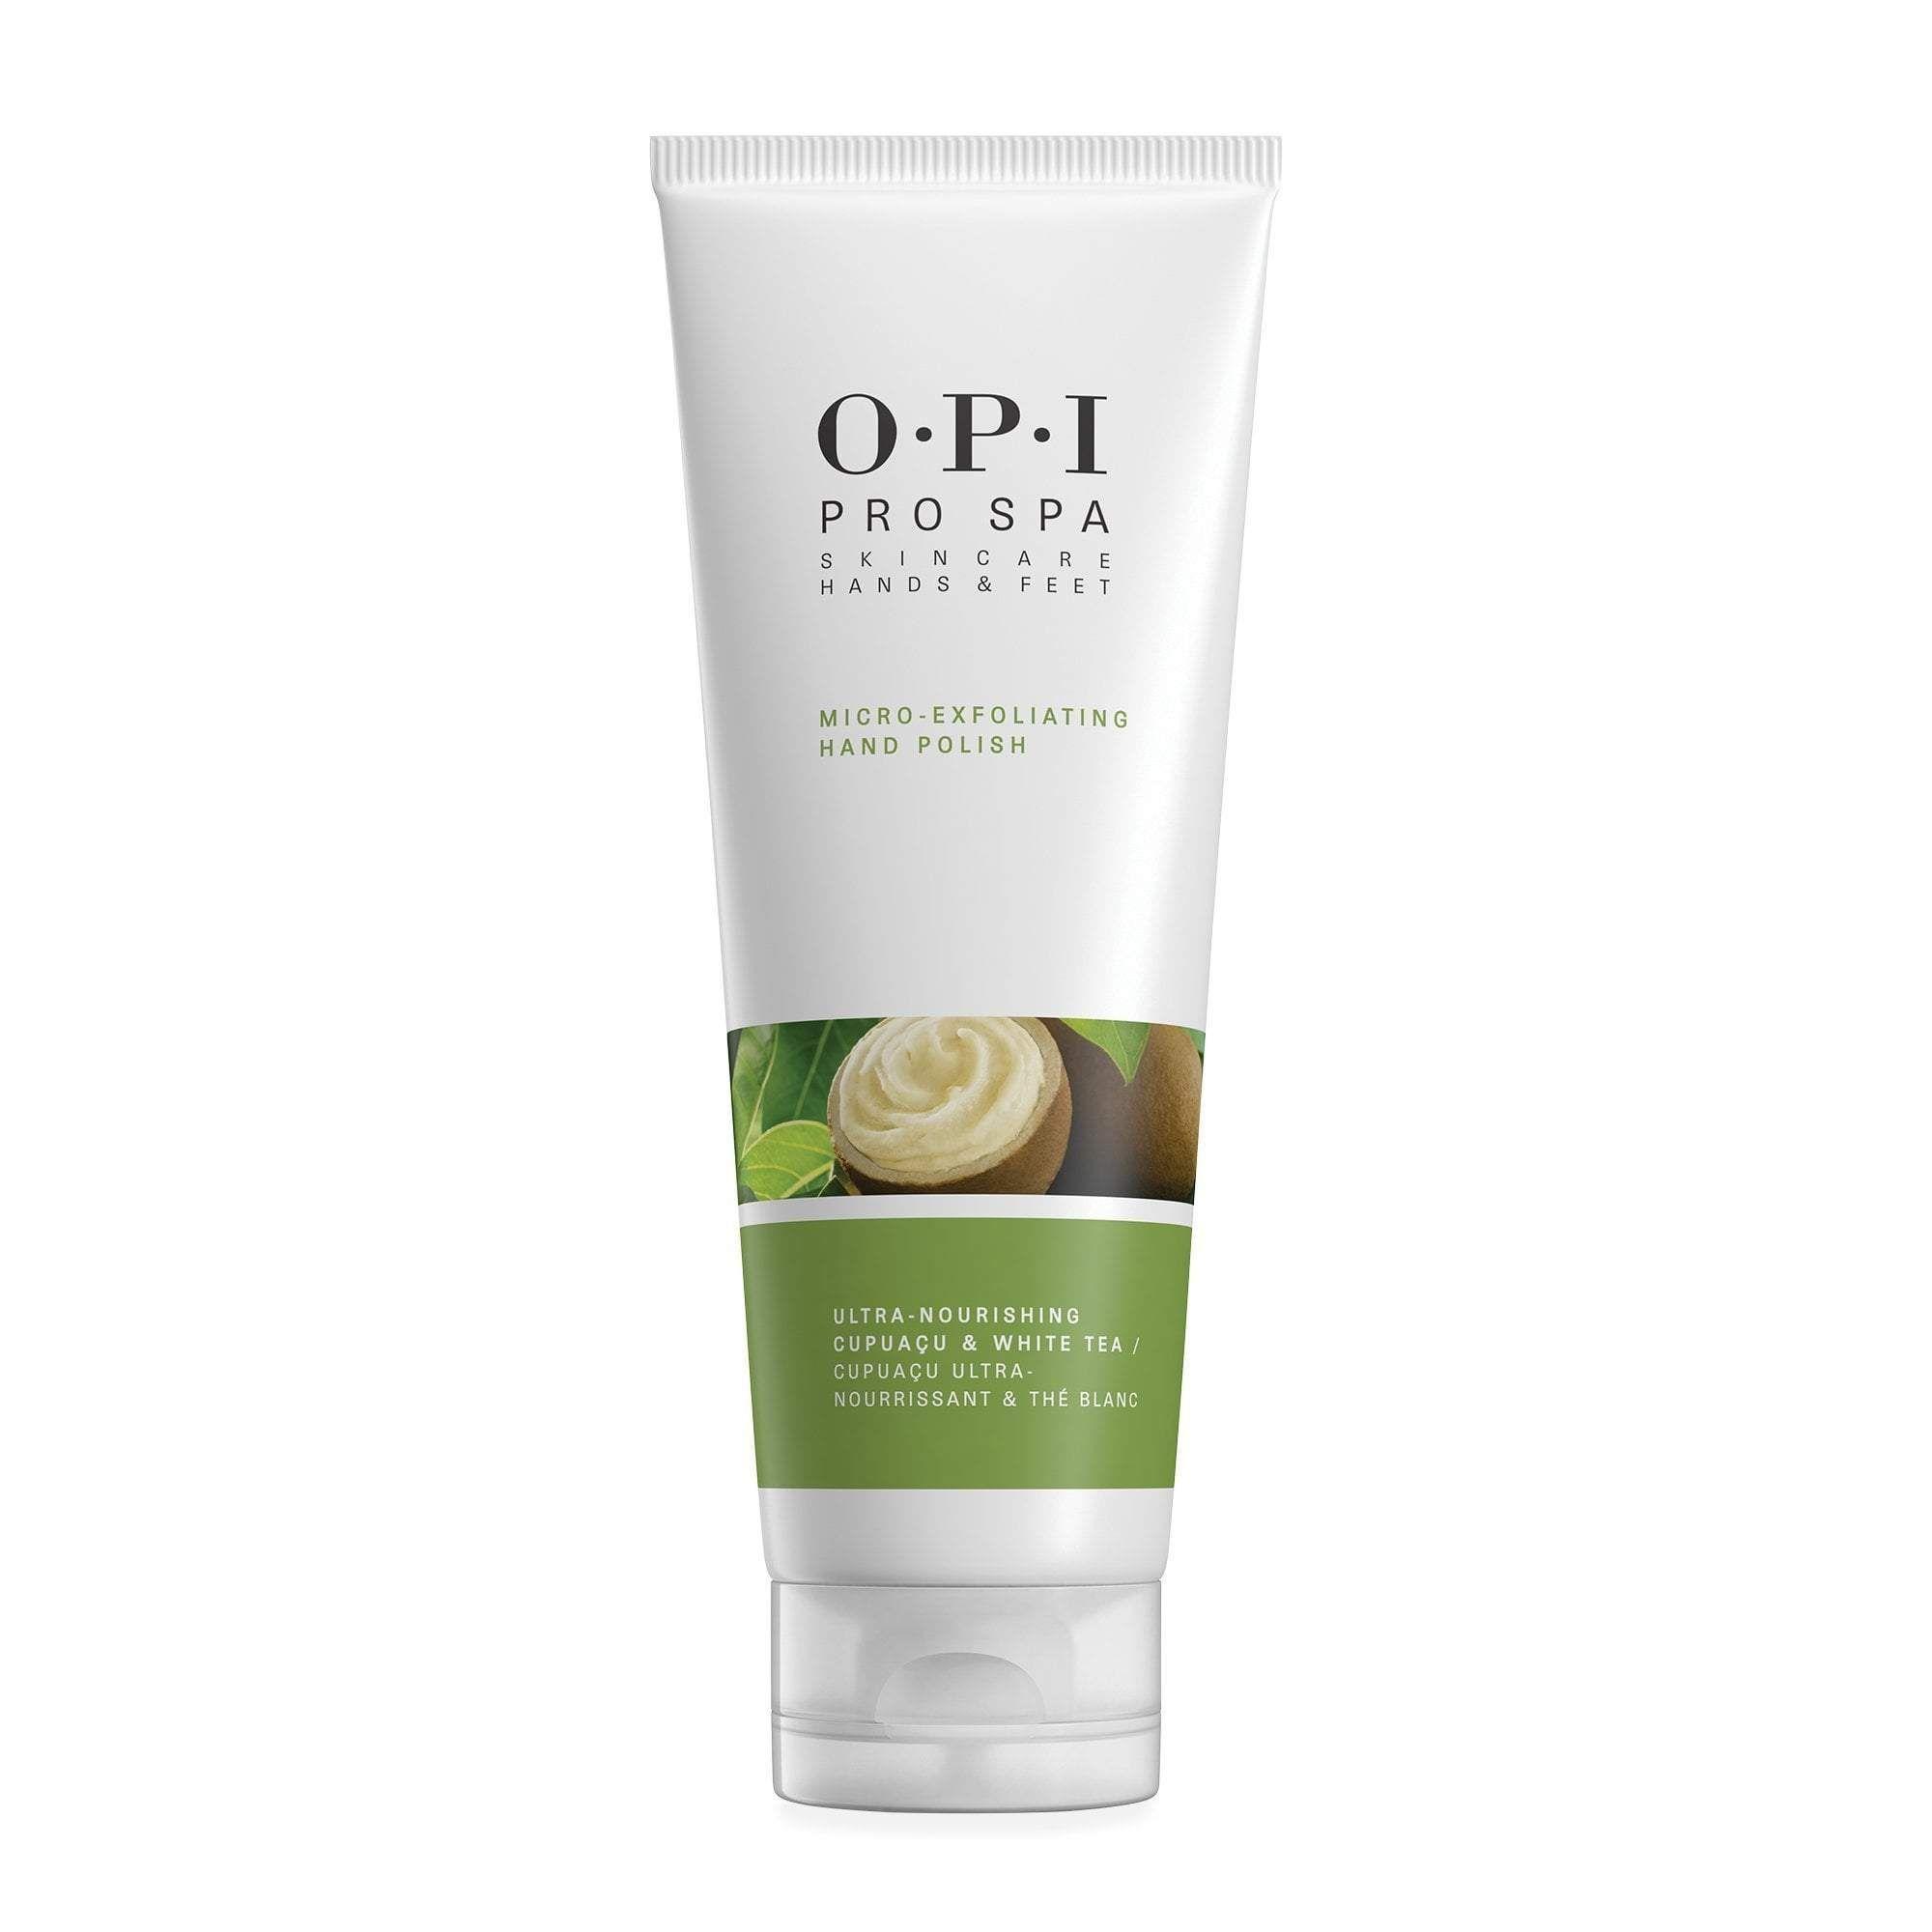 Opi Micro Exfoliating Hand Polish Skin Care Toner Products Exfoliating Lip Scrub Skin Care